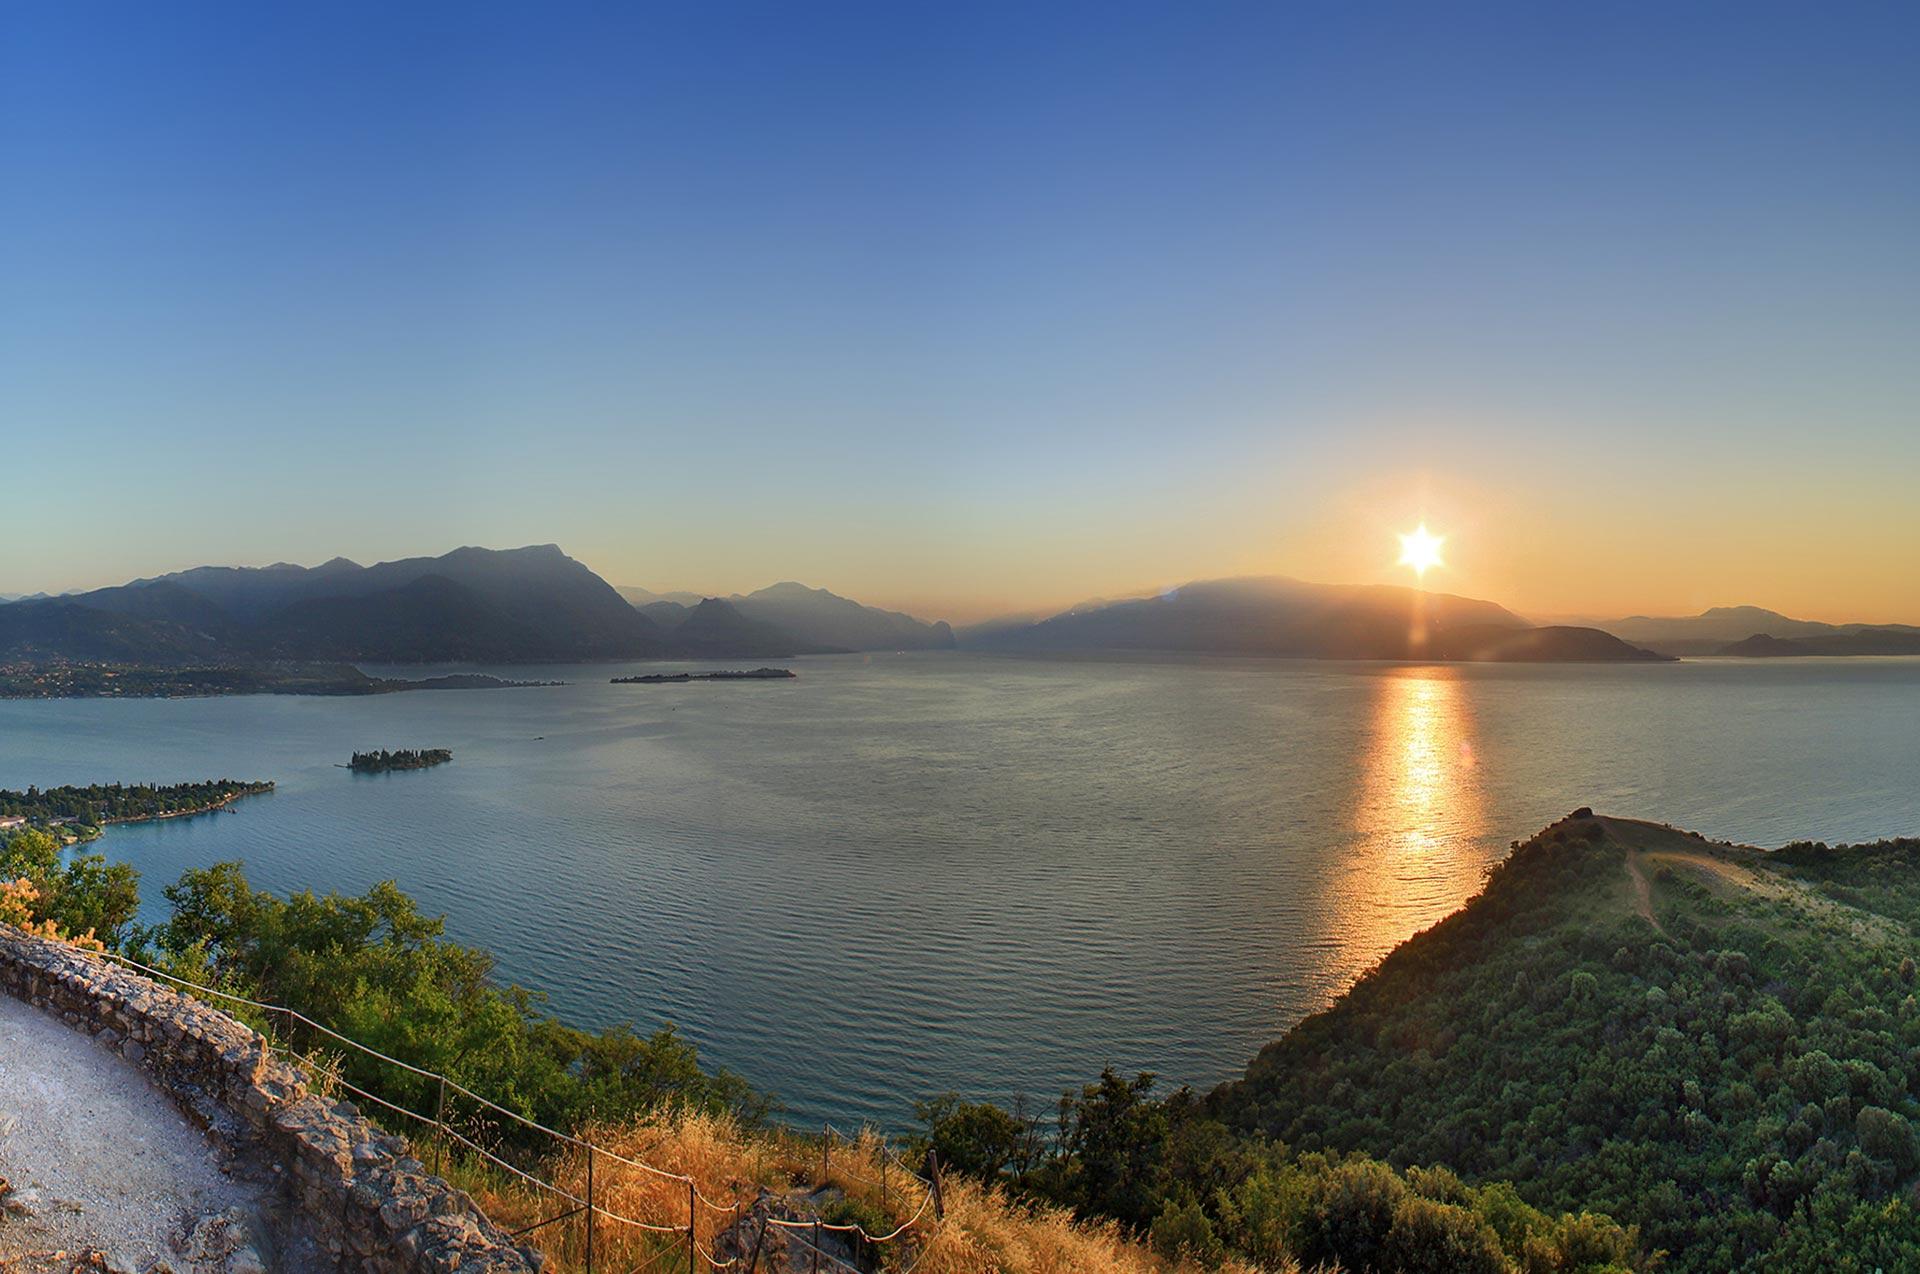 Agriturismo sul lago di Garda La Filanda - Manerba del Garda